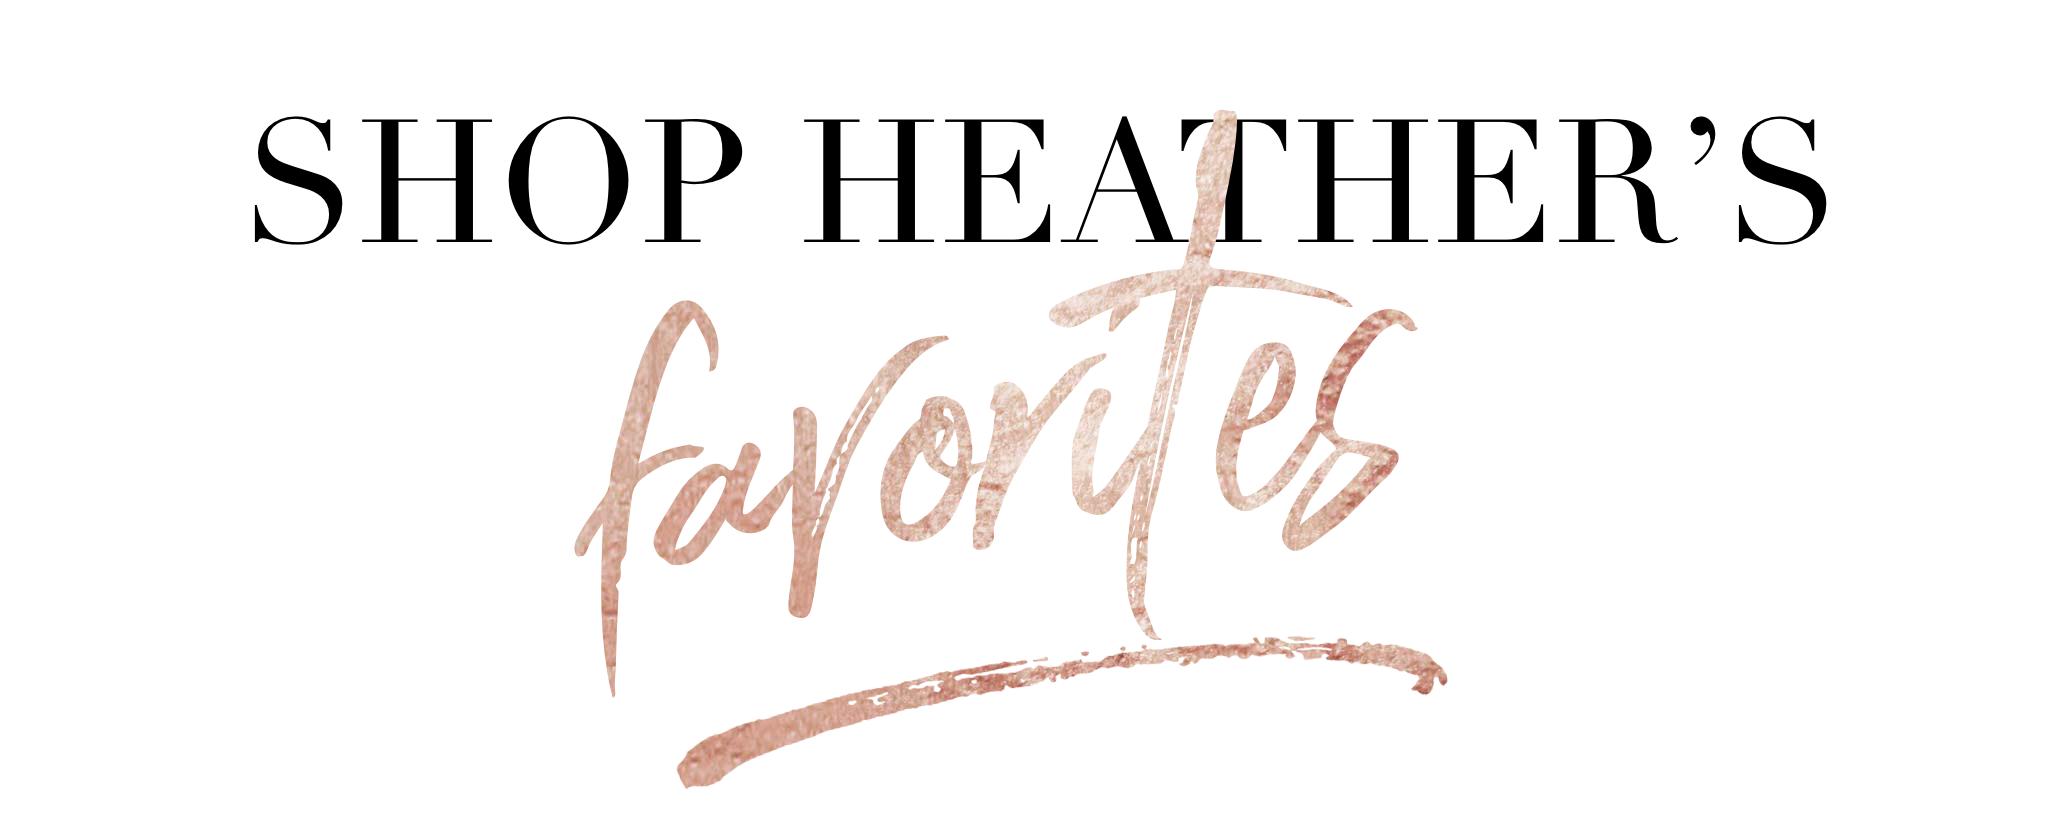 shop heather's favorites.png